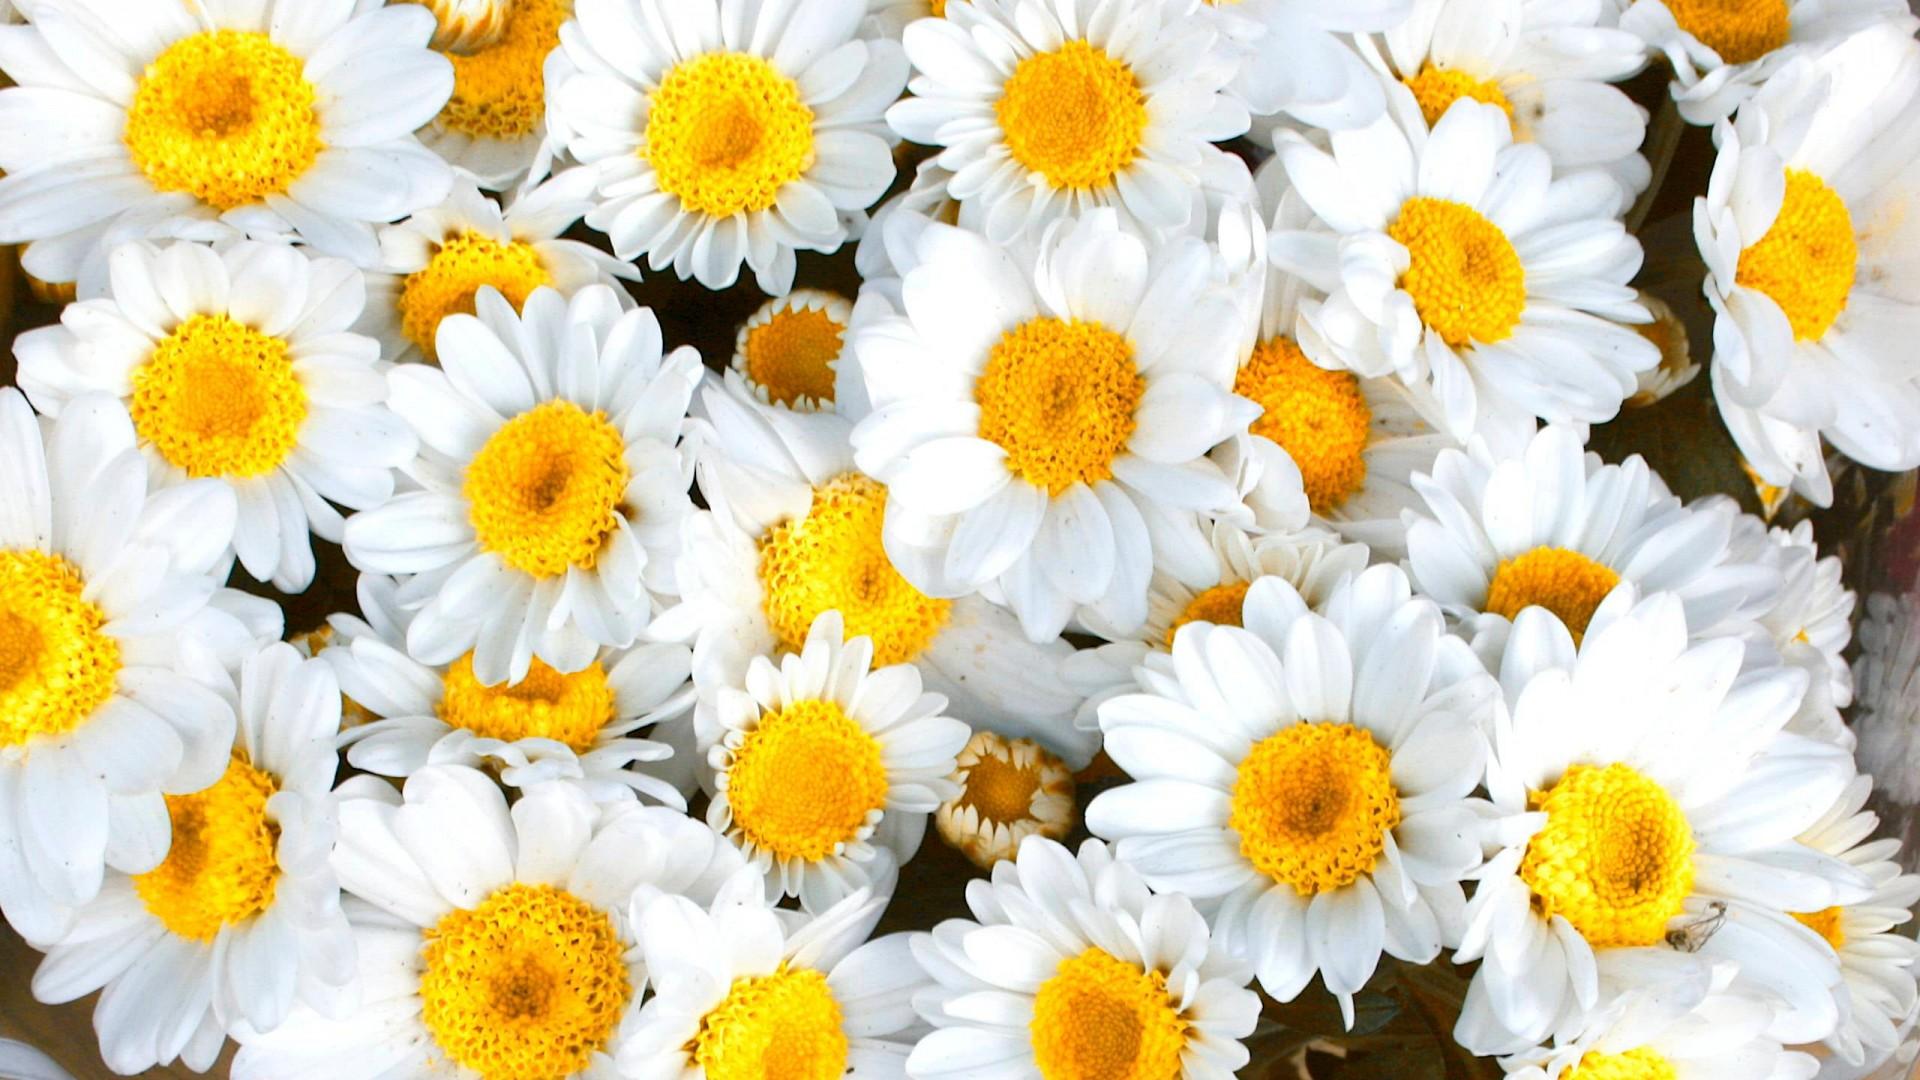 daisy yellow-white petaled flowers HD Wallpaper